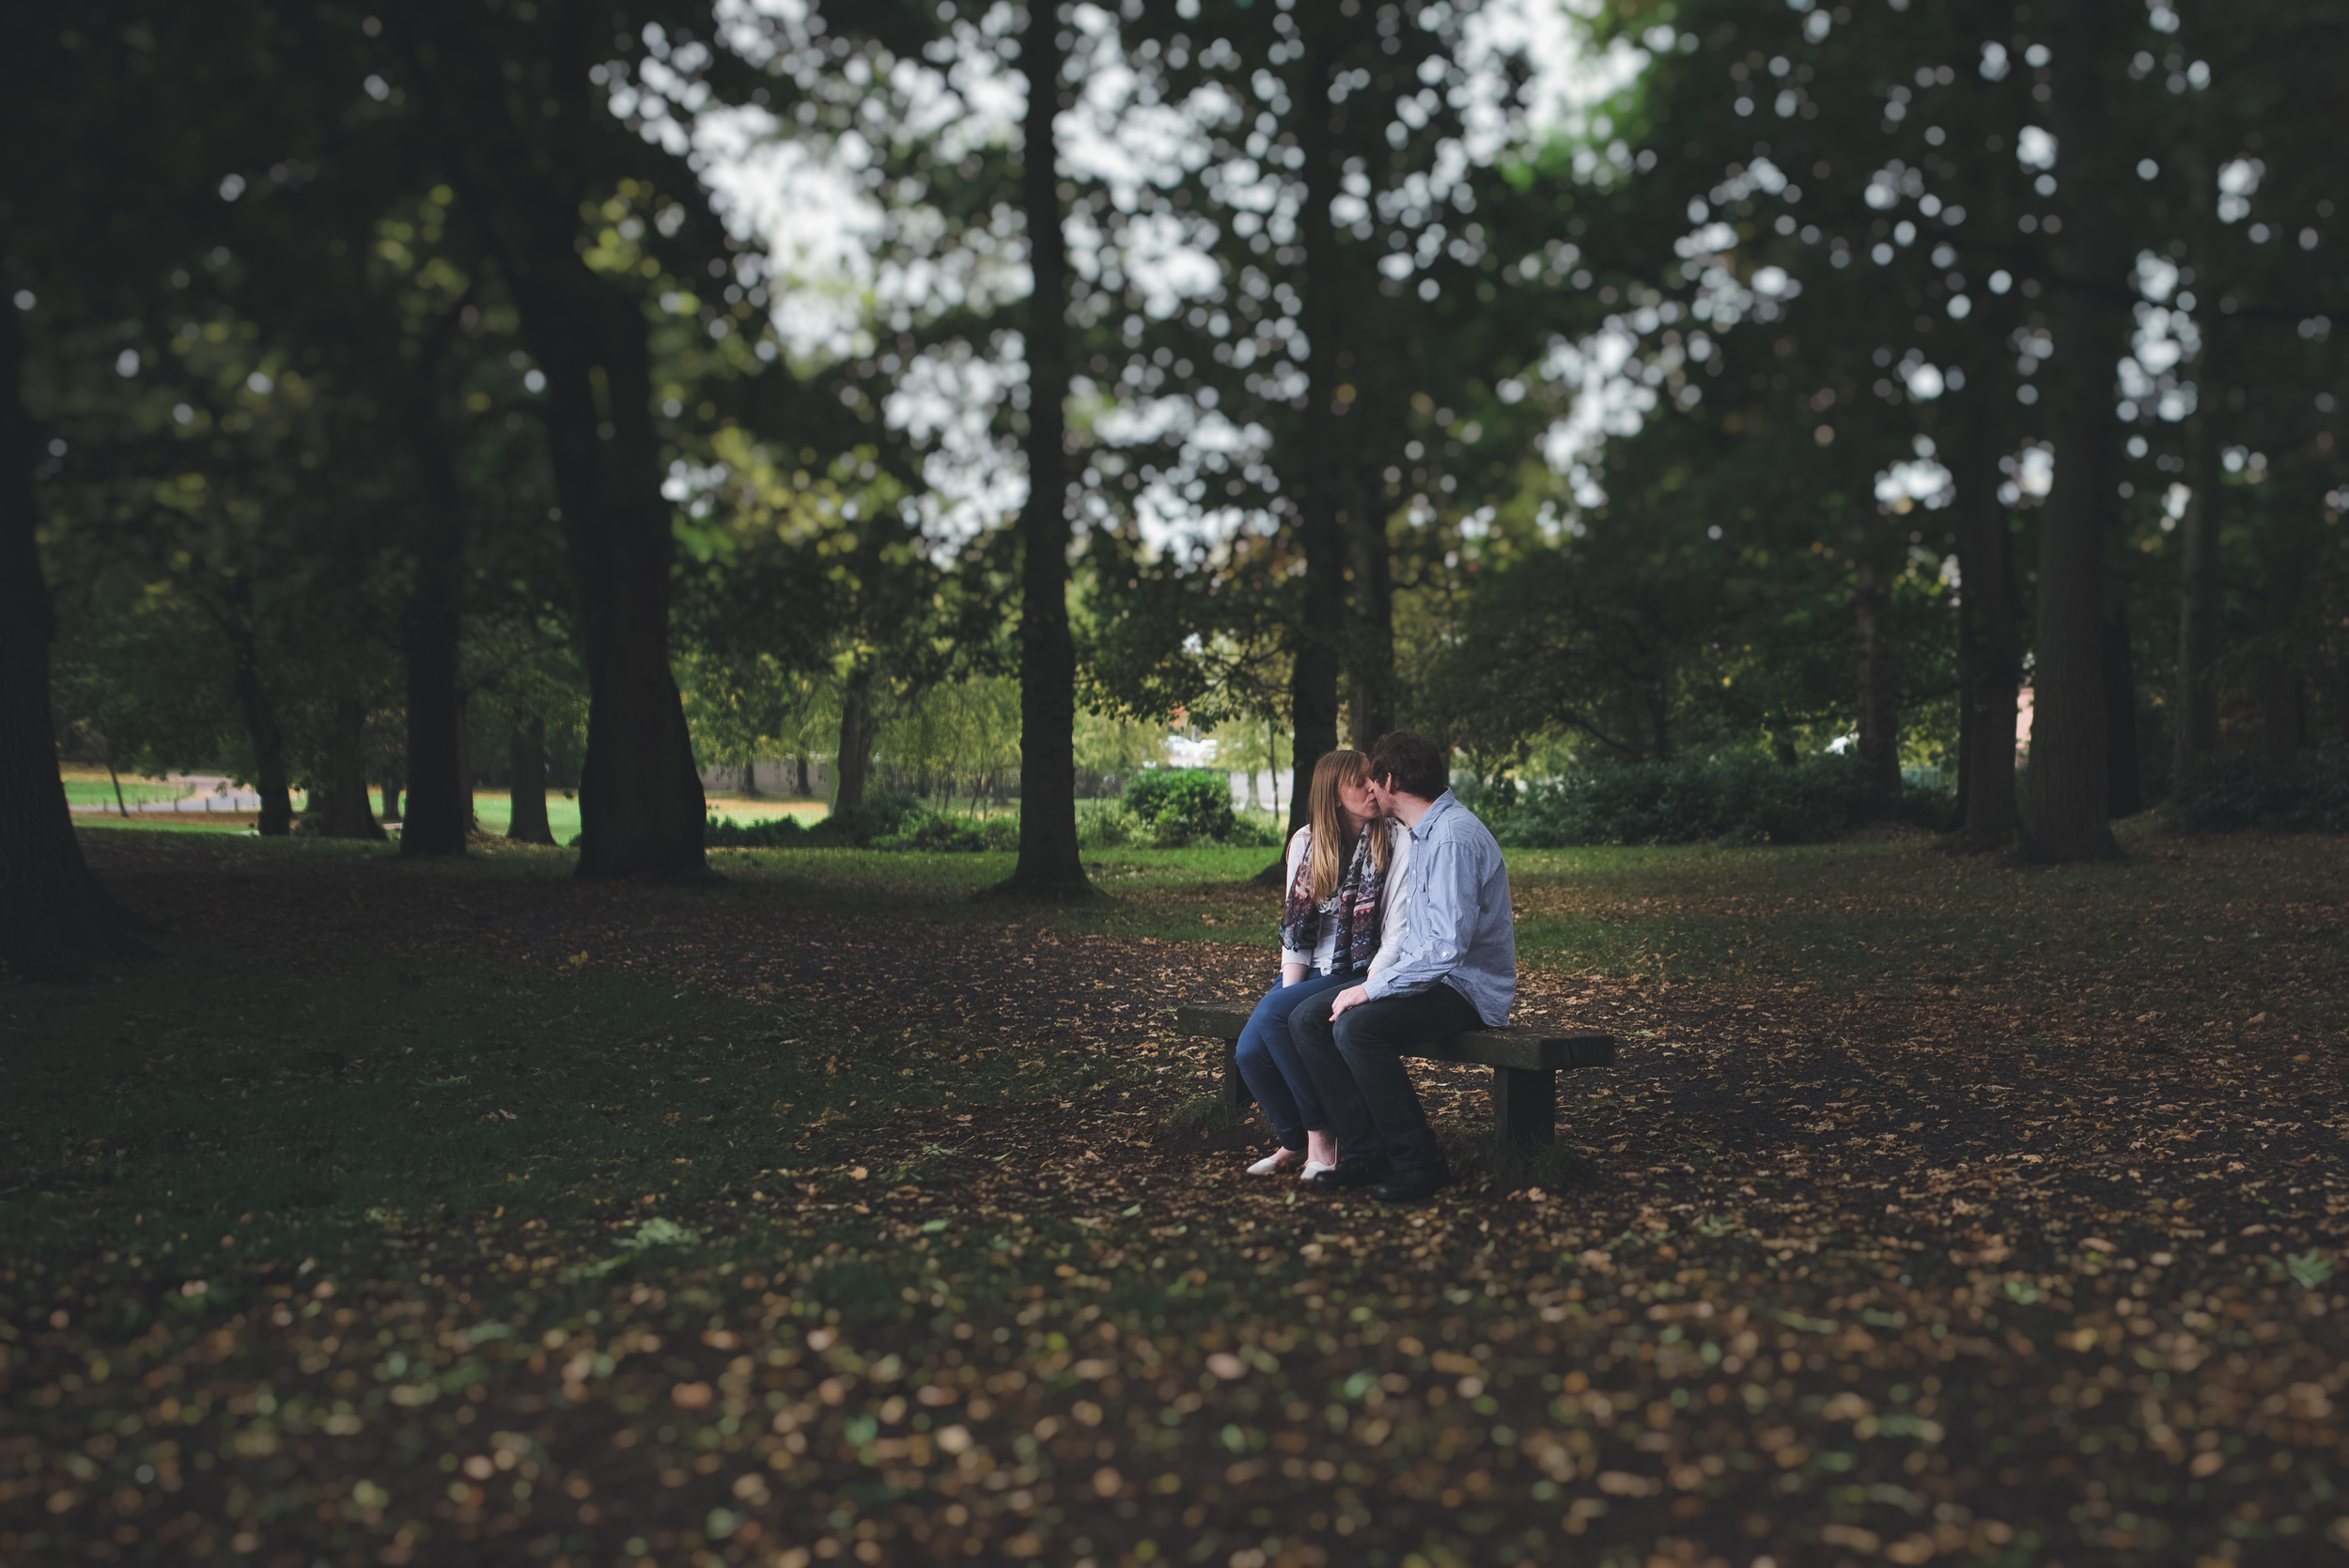 Northern_Ireland_Engagement_Photography_purephotoni_Lurgan_Park_Kiss